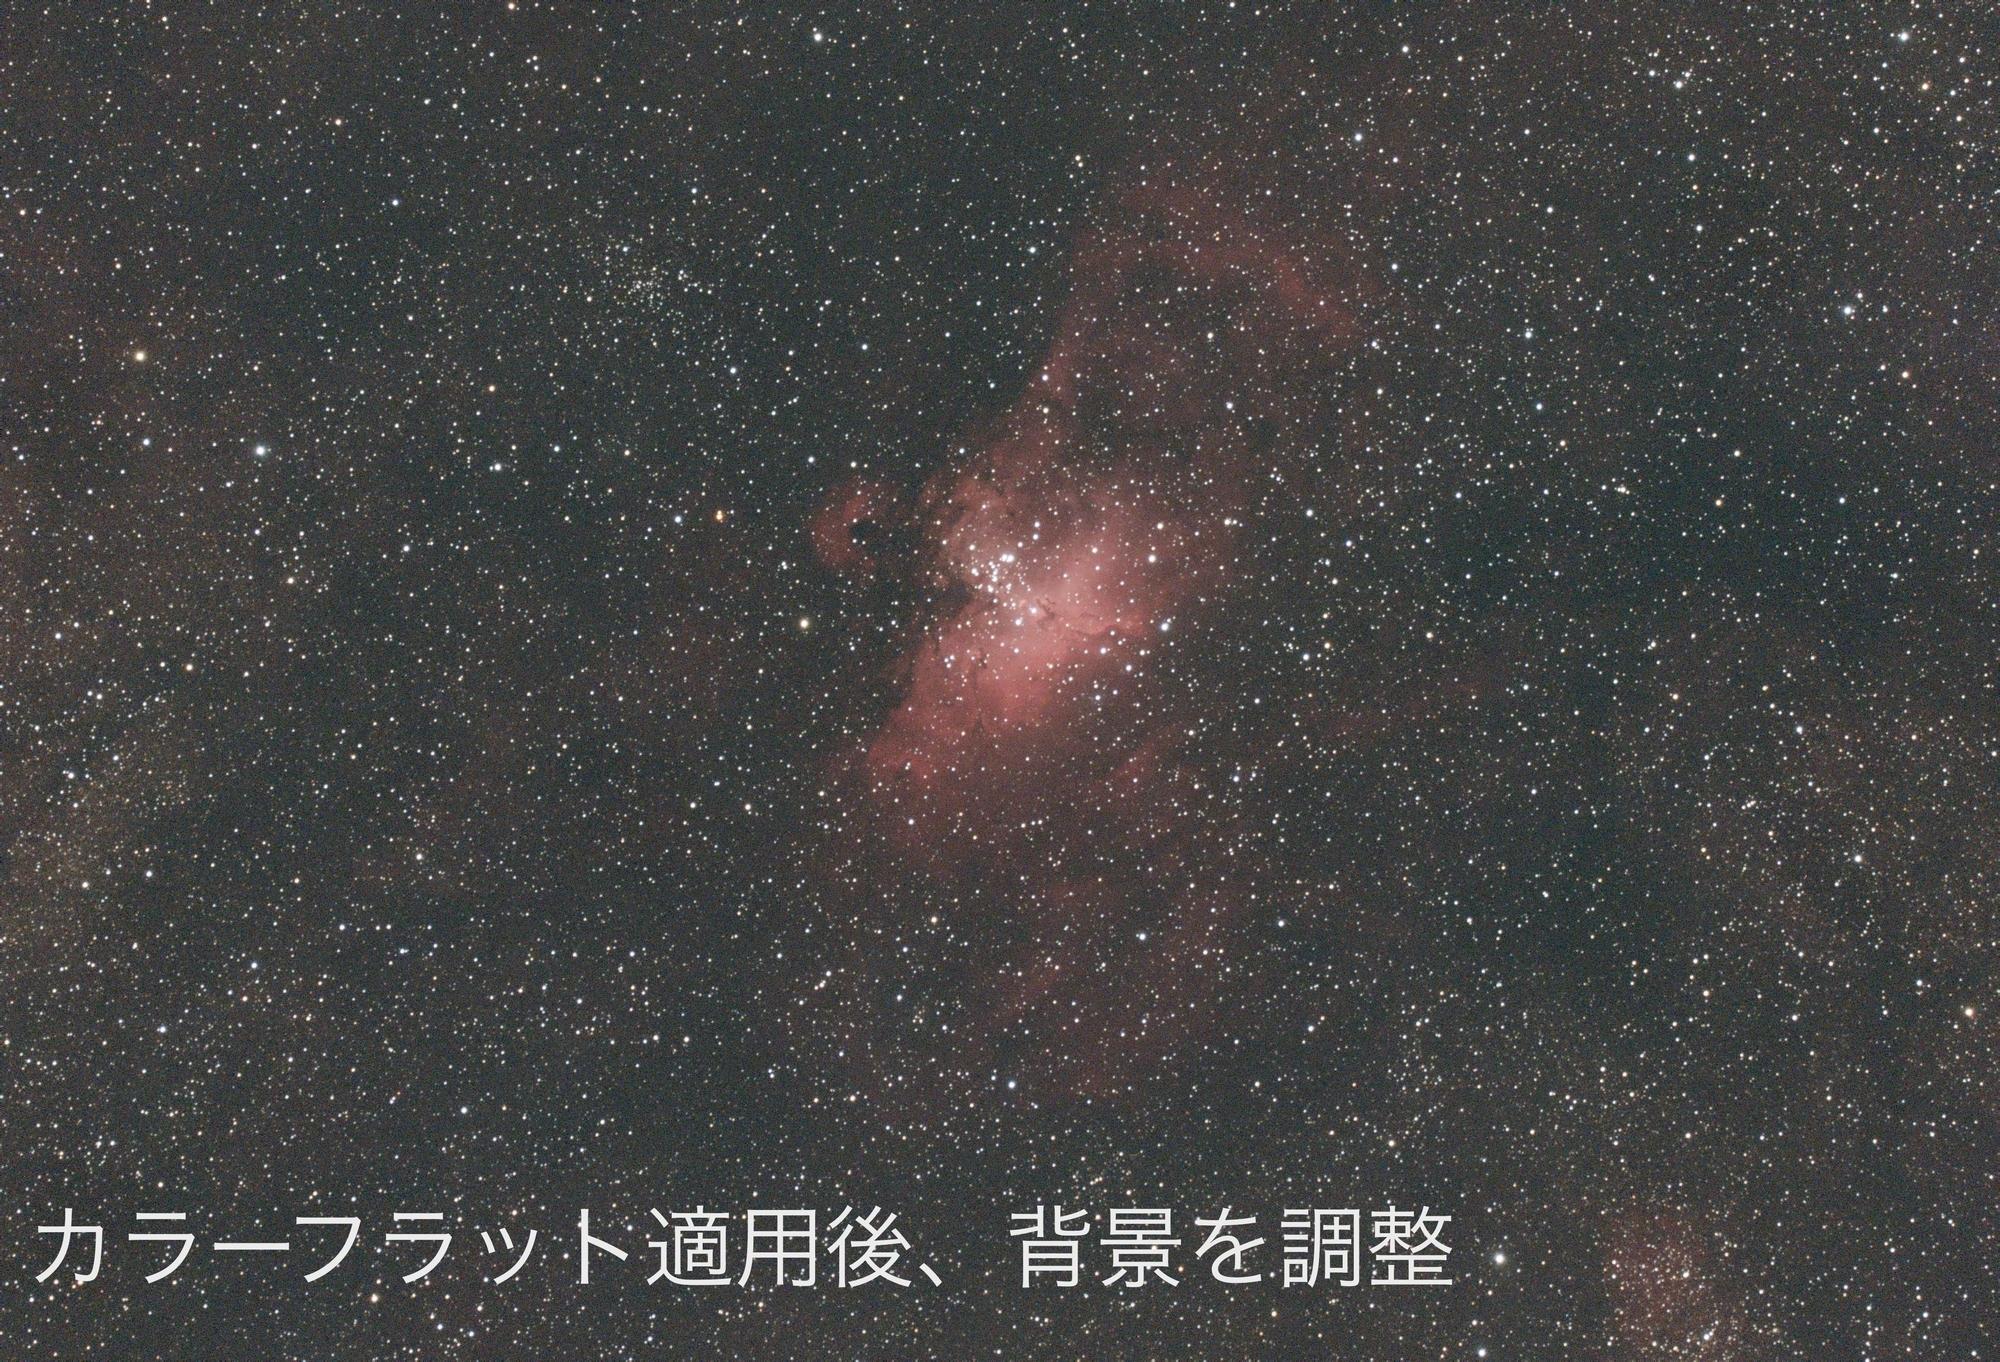 f:id:snct-astro:20200519233154j:plain